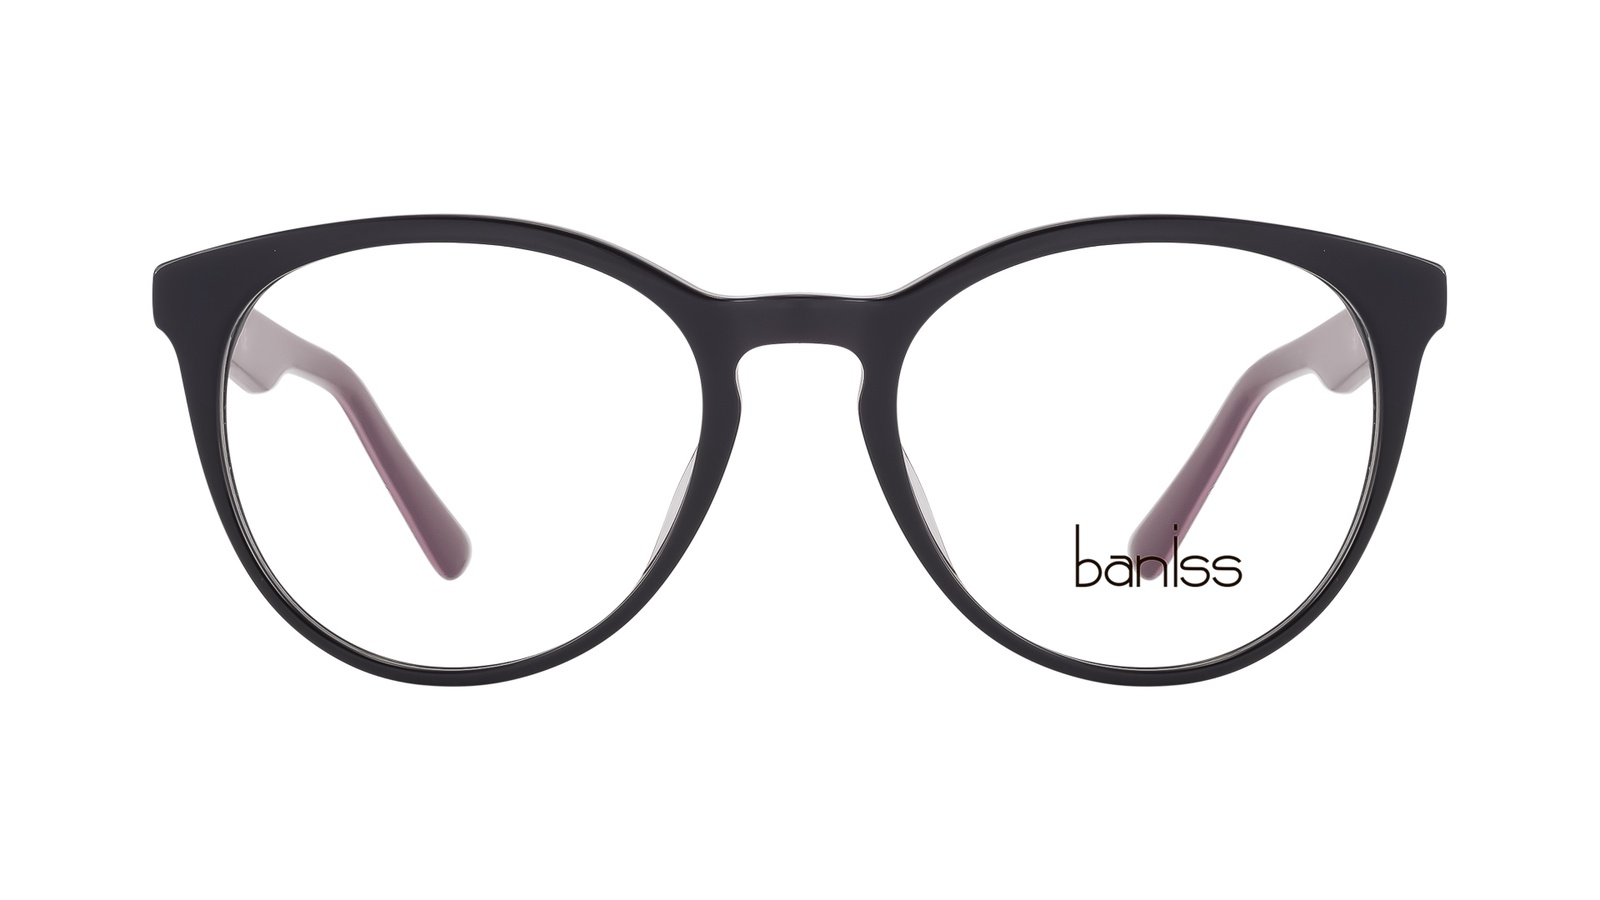 Оправа для очков, BANISS, пластик, BS7022 C01